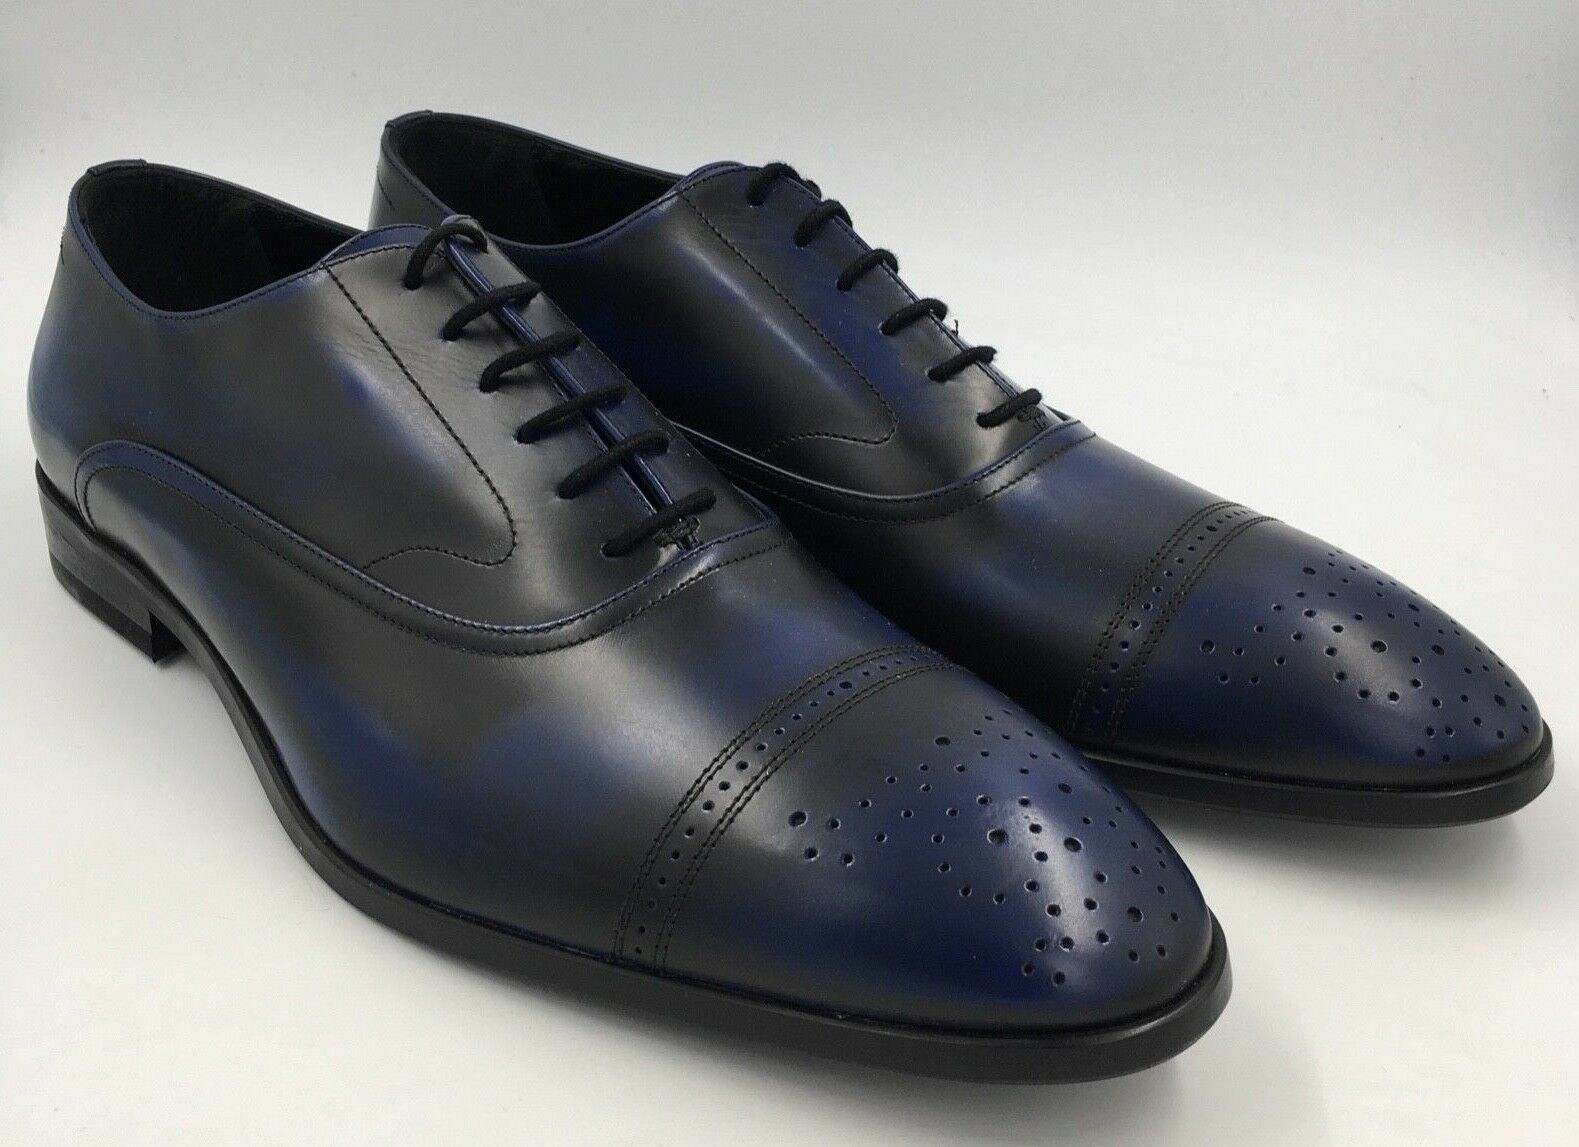 HEMSTED & SONS  Herren DERBY NAVY Schuhe Blau OXFORD BROGUE Schuhe NAVY UK 9.5 SIZE 44 M0087 c7a366